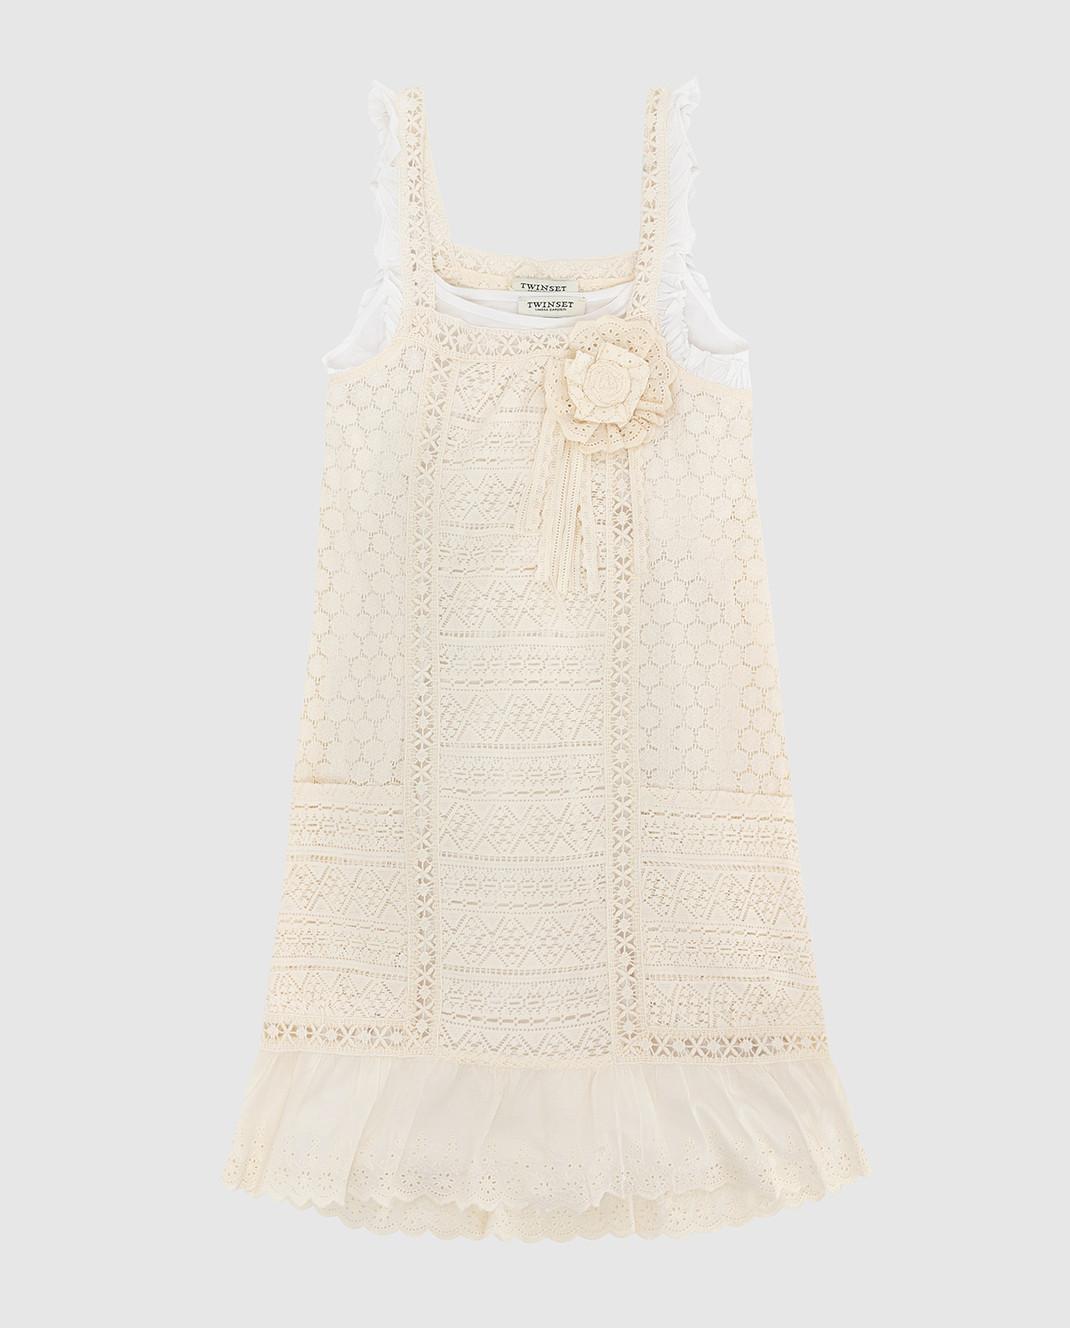 Twin Set Детское светло-бежевое платье GS82Z31216